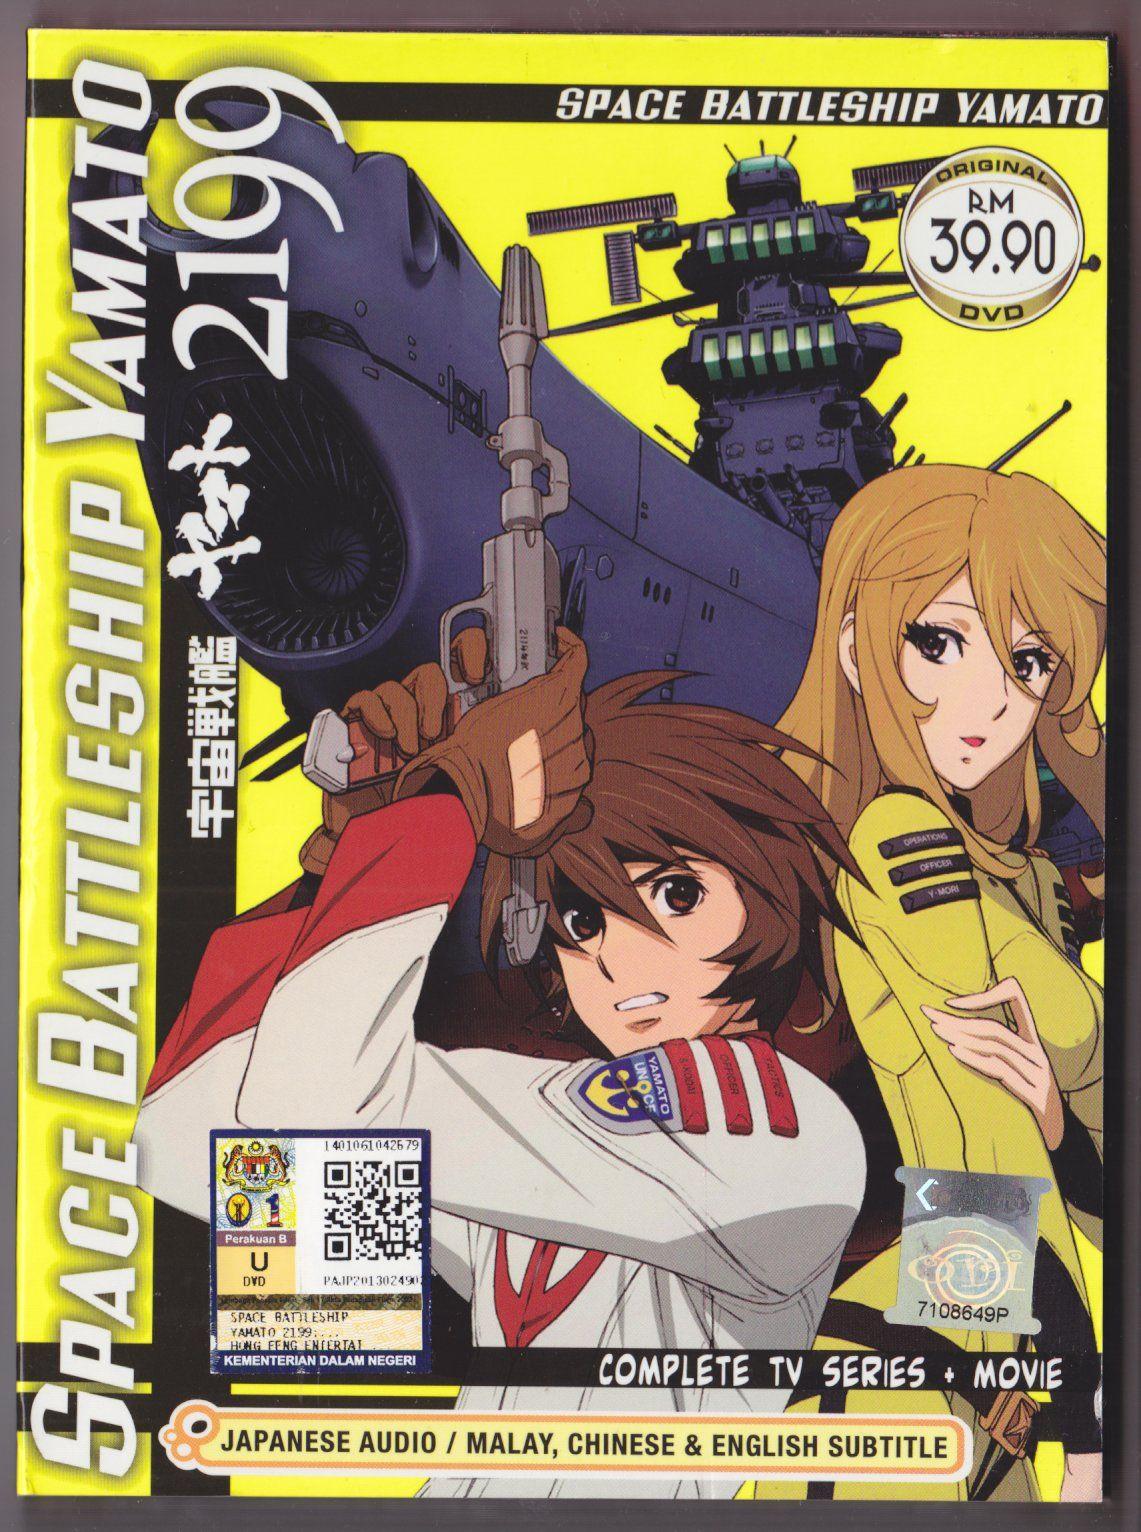 GEEK BROLL Anime Review Space Battleship Yamato 2199